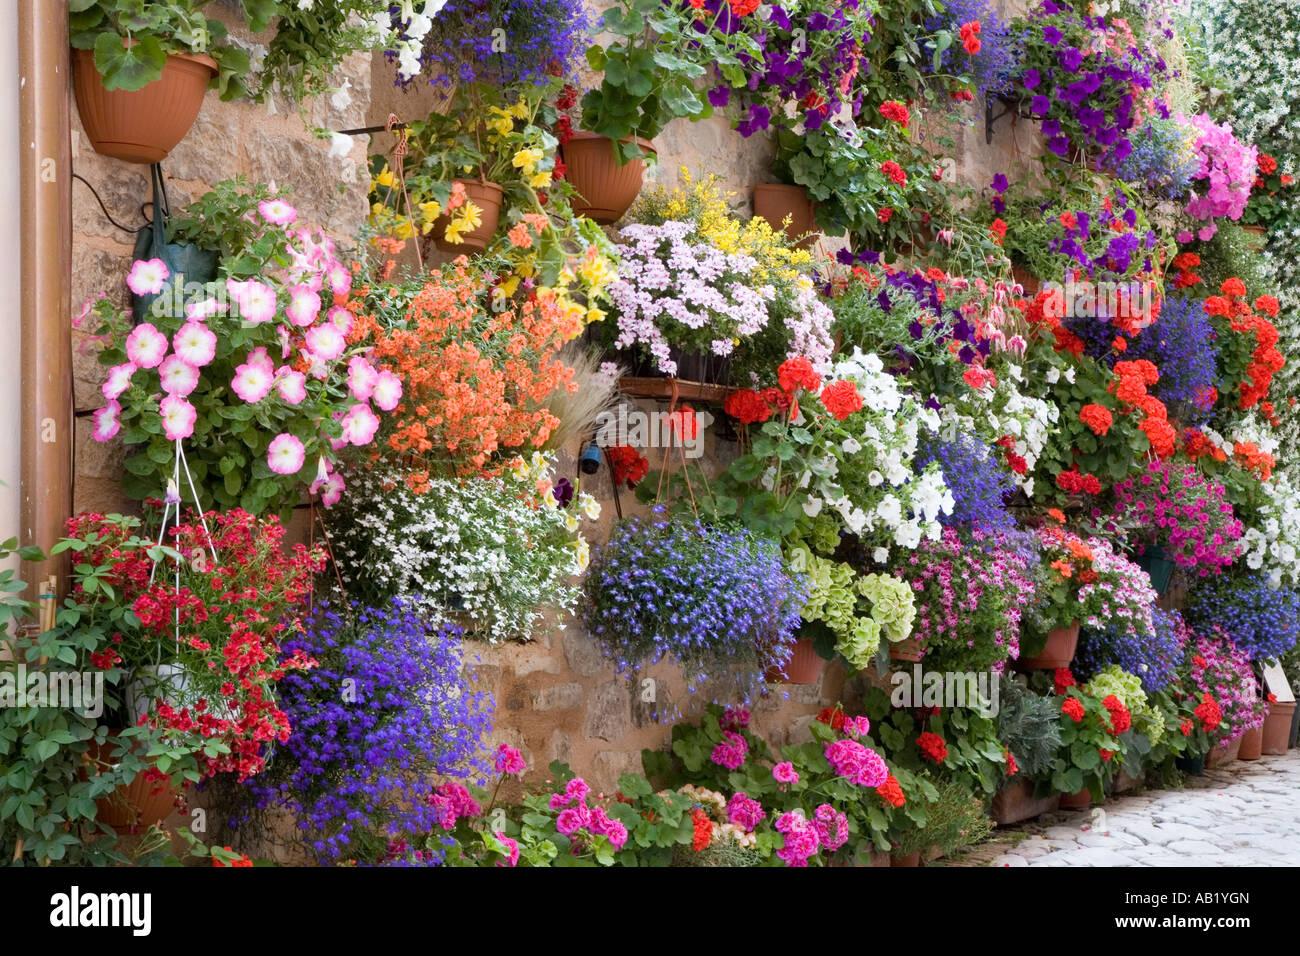 wall hanging baskets petunia bouquet fresh growing ornamental stock photo 12750836 alamy. Black Bedroom Furniture Sets. Home Design Ideas